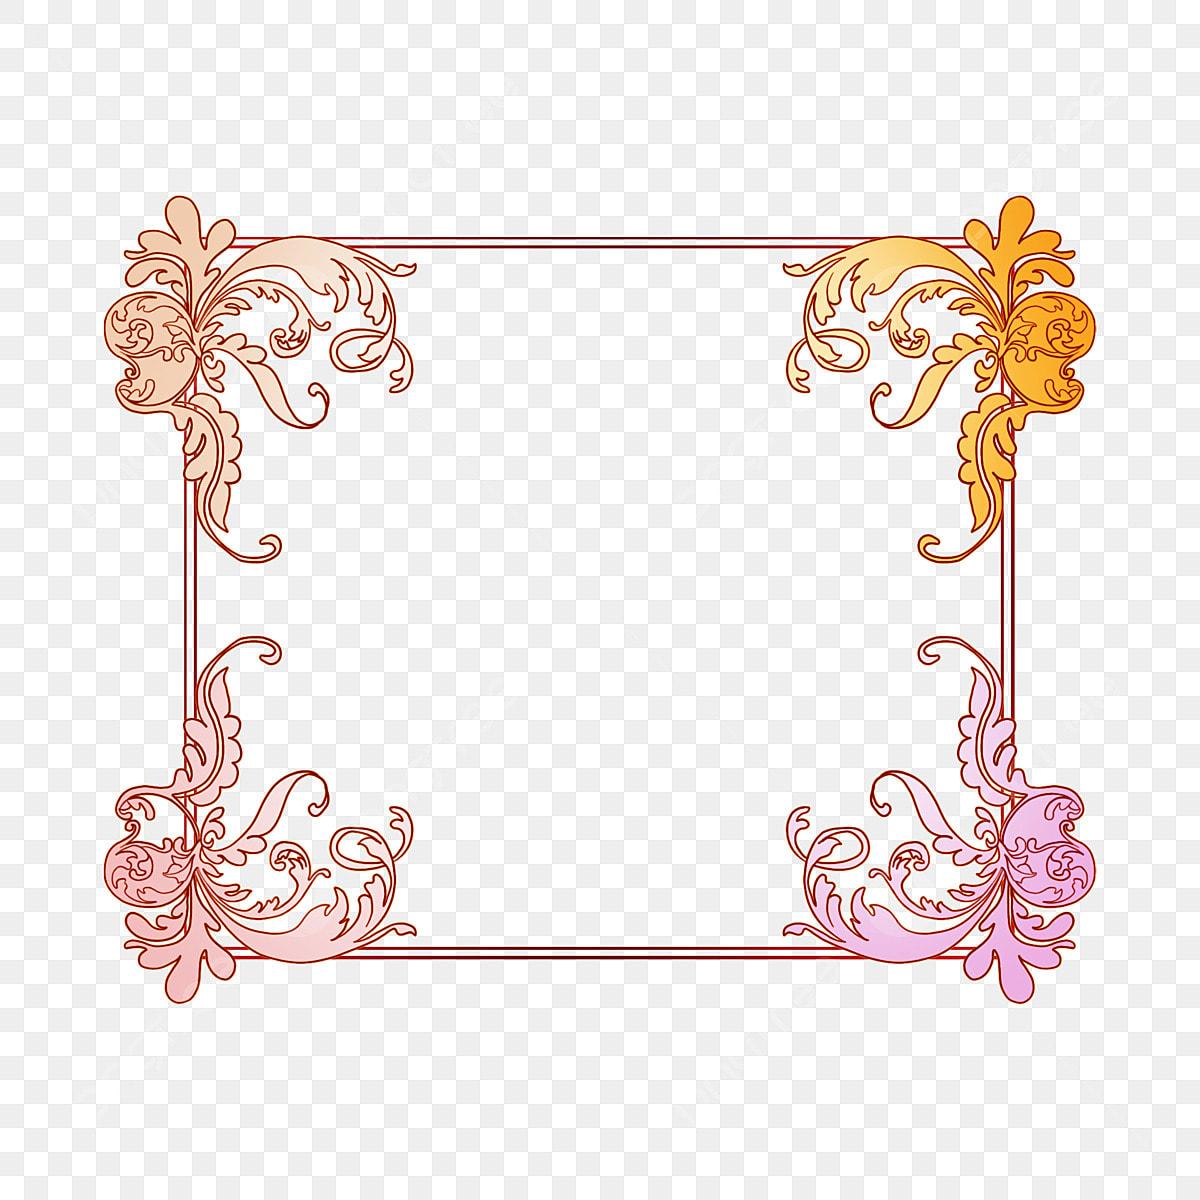 Boite A Fleurs Rose Illustration De Dessin Anime Illustration De